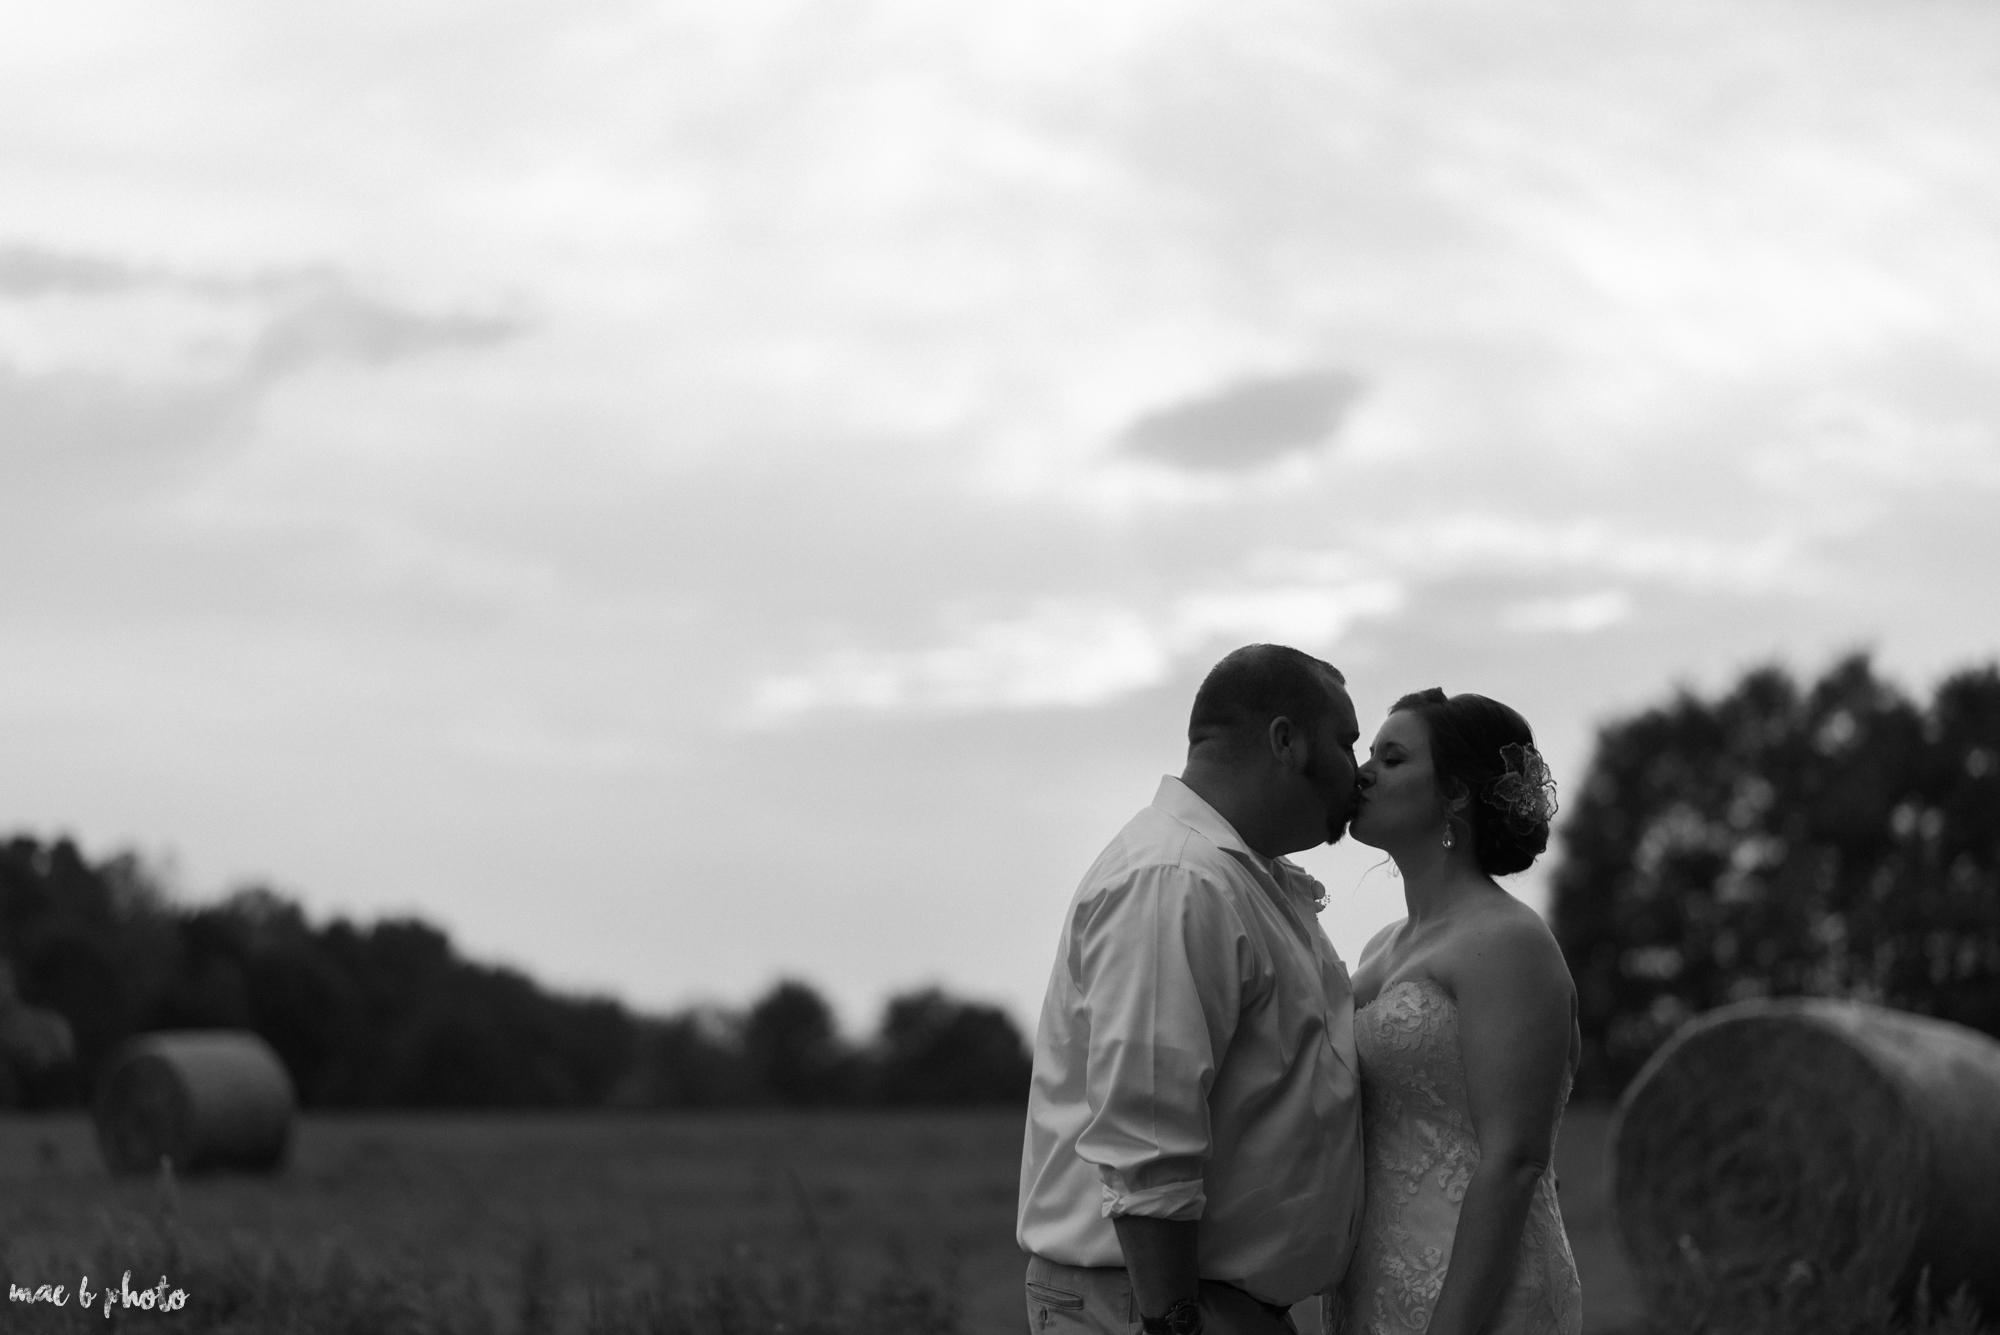 Sarah & Dustin's Rustic Chic Barn Wedding at Hartford Hill Winery in Hartford, Ohio by Mae B Photo-80.jpg